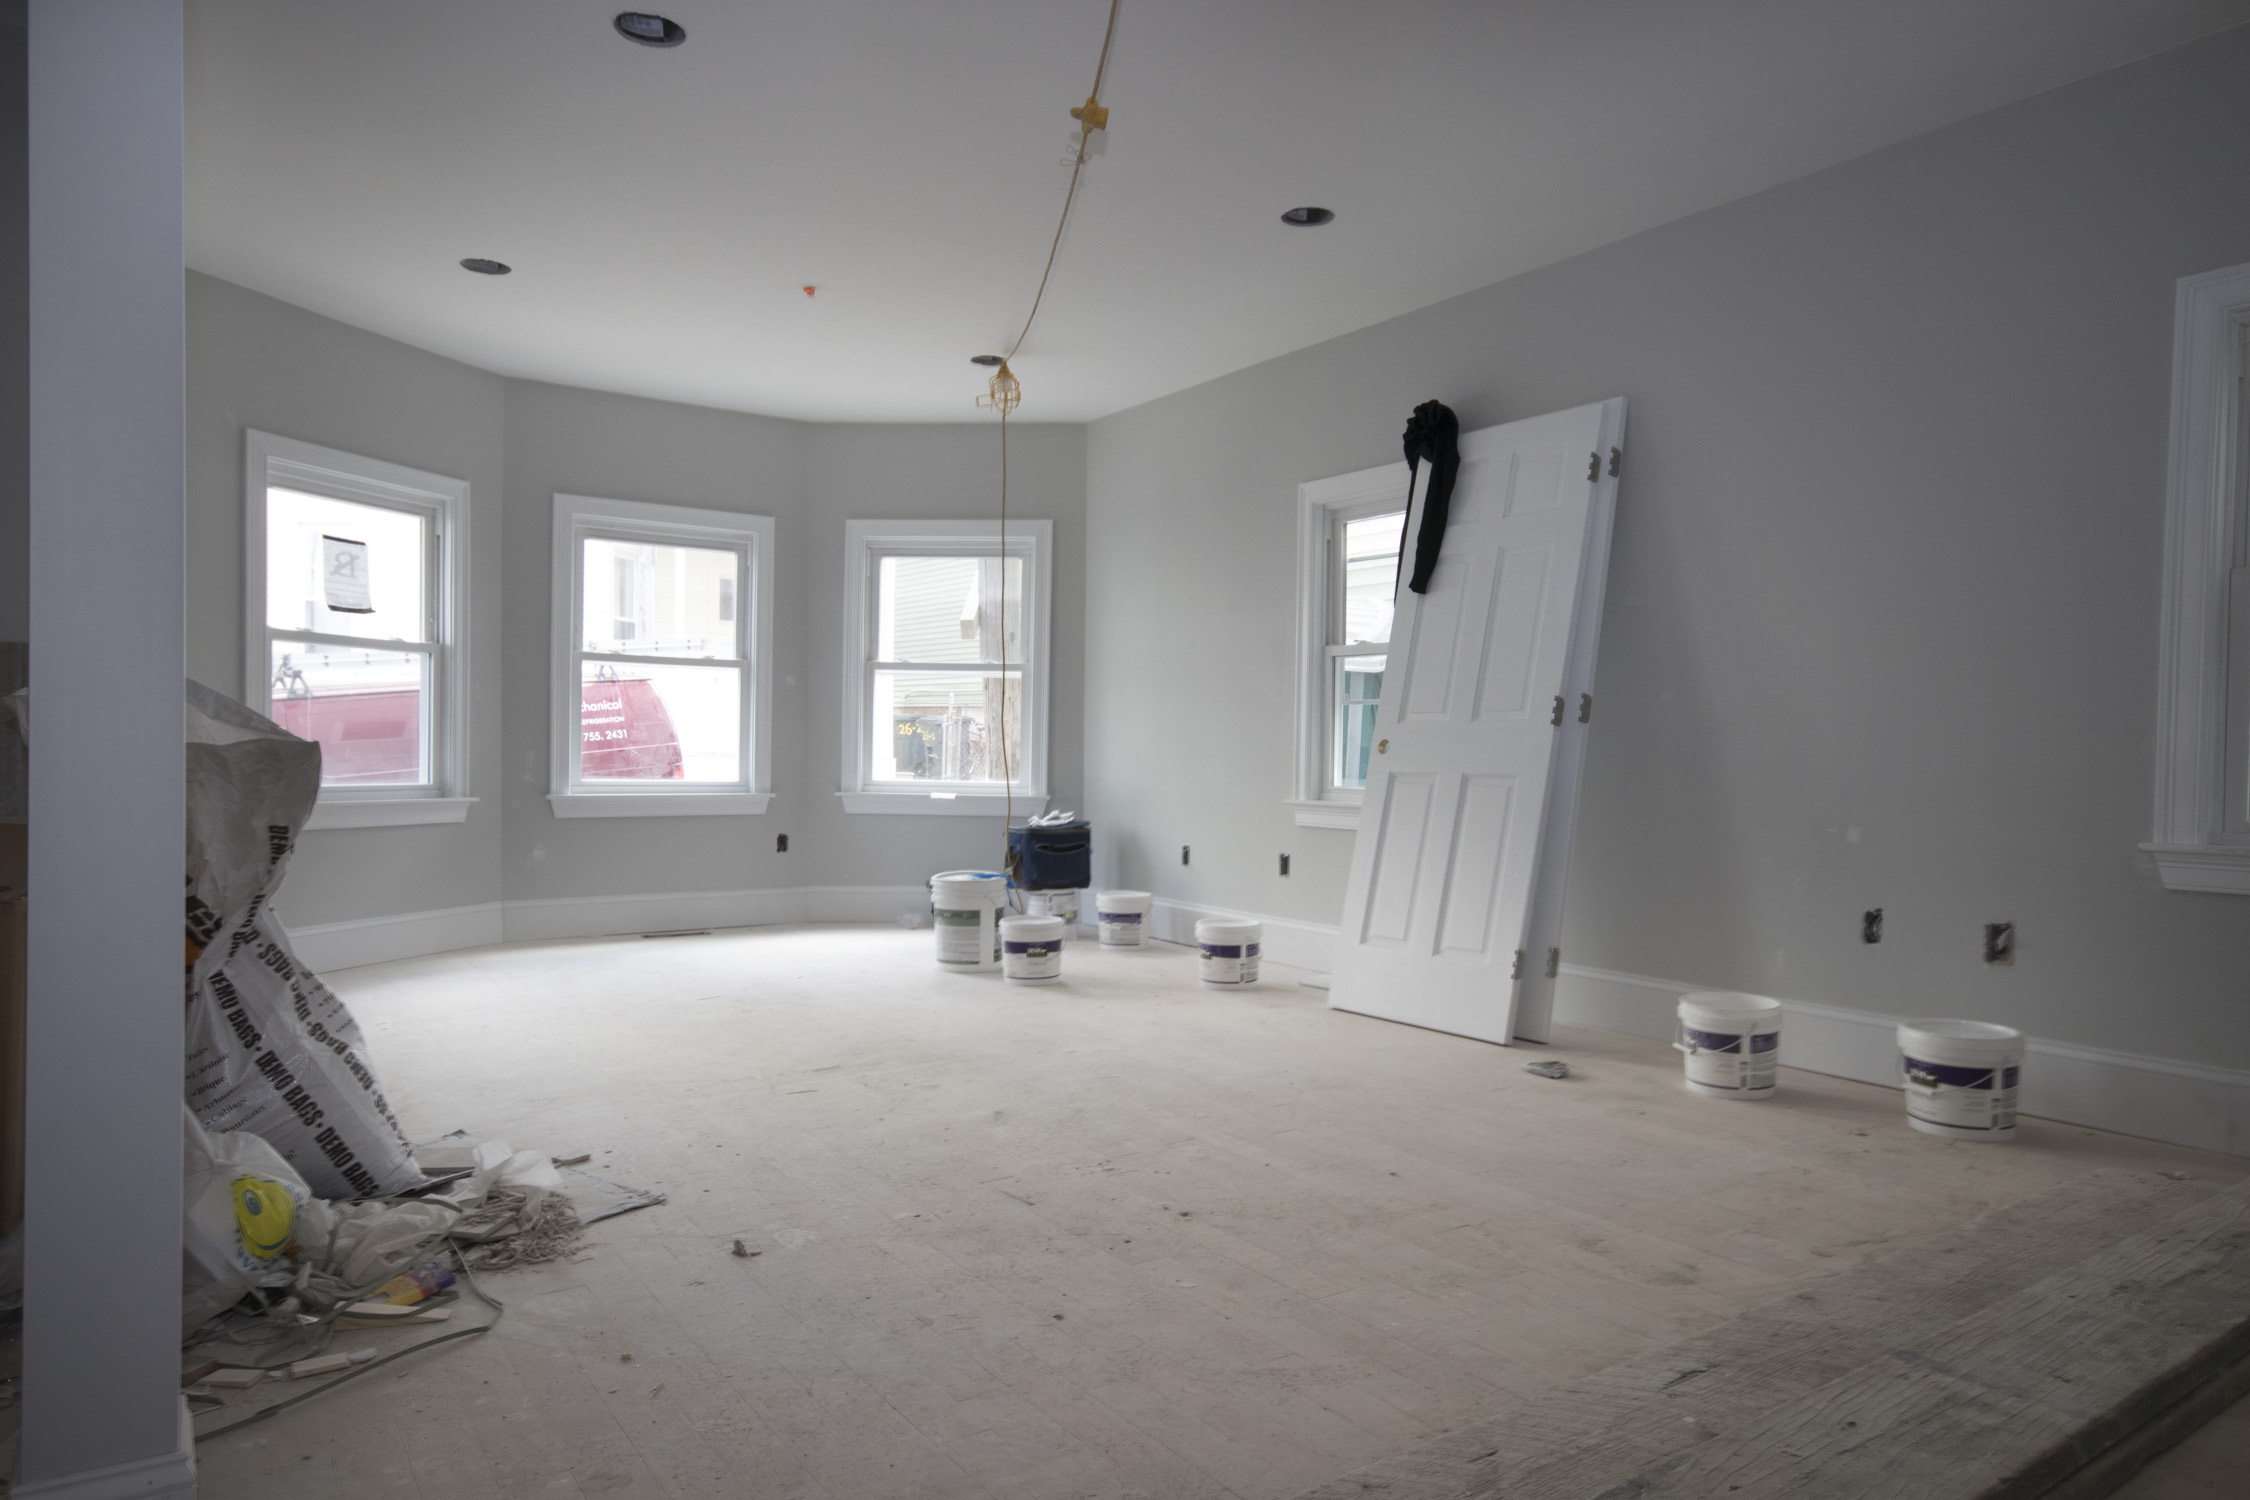 P. Northeast Contractors 27 Darling Street Boston Condo Renovation_19-23